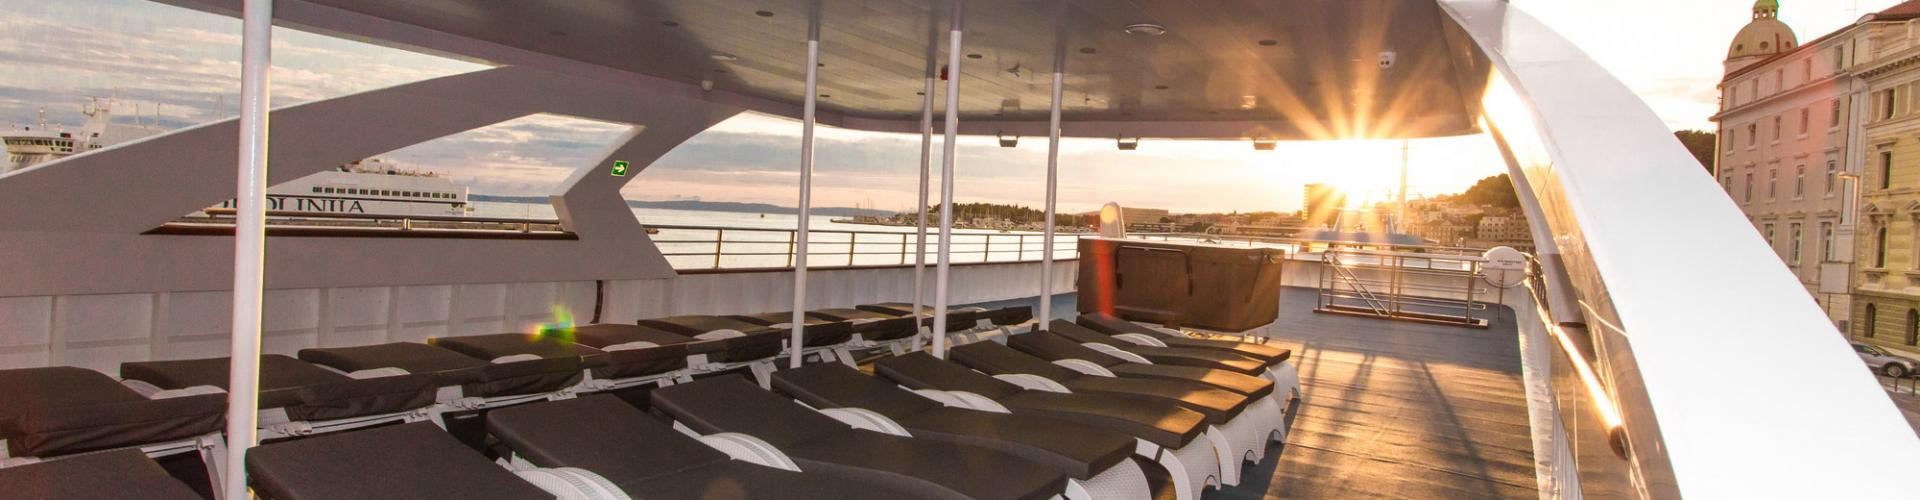 2017. Deluxe Superior cruiser MV Maritimo